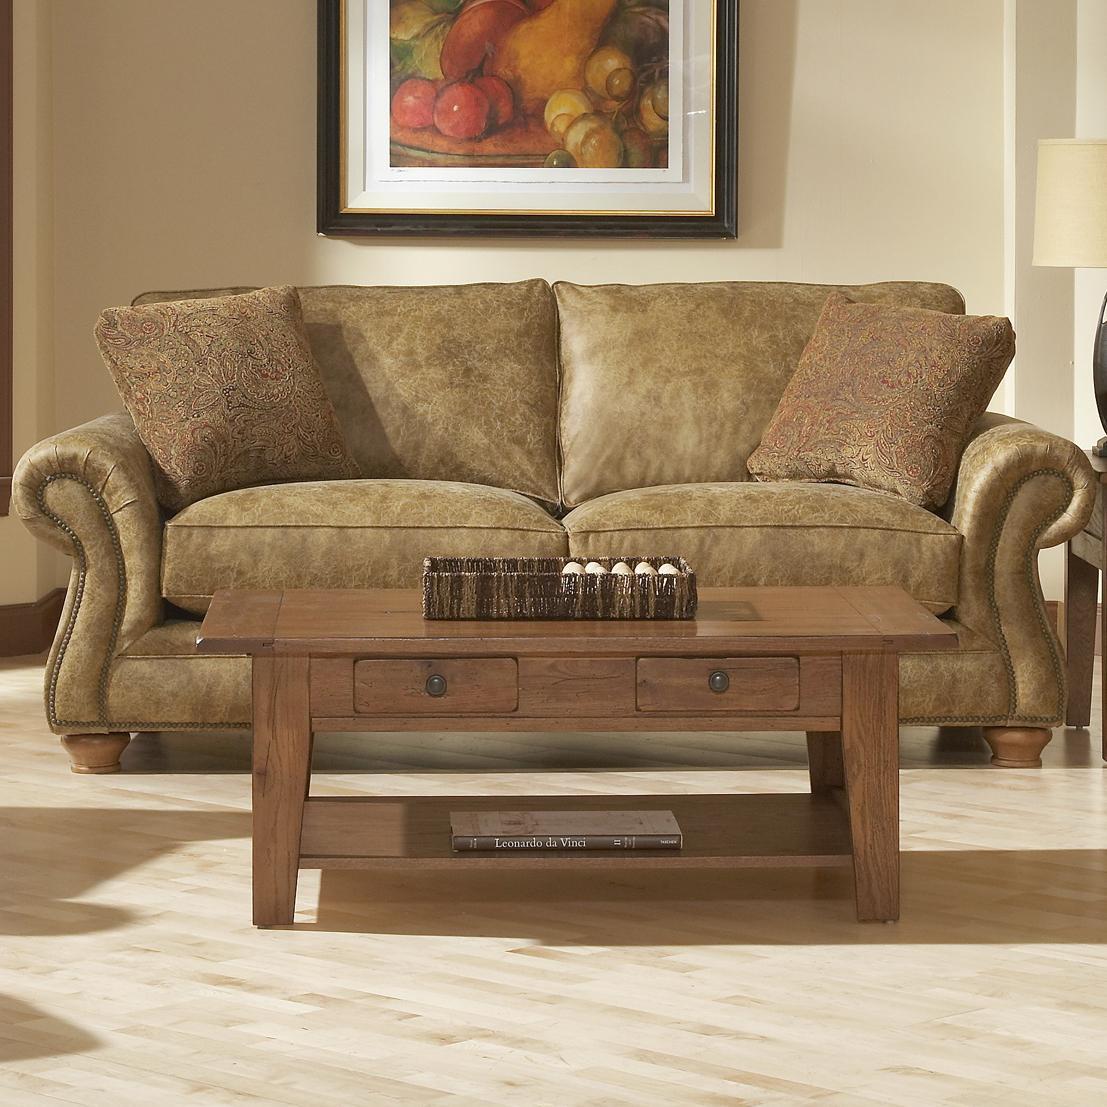 Broyhill Furniture Laramie Sofa W Nail Head Trim Lindy